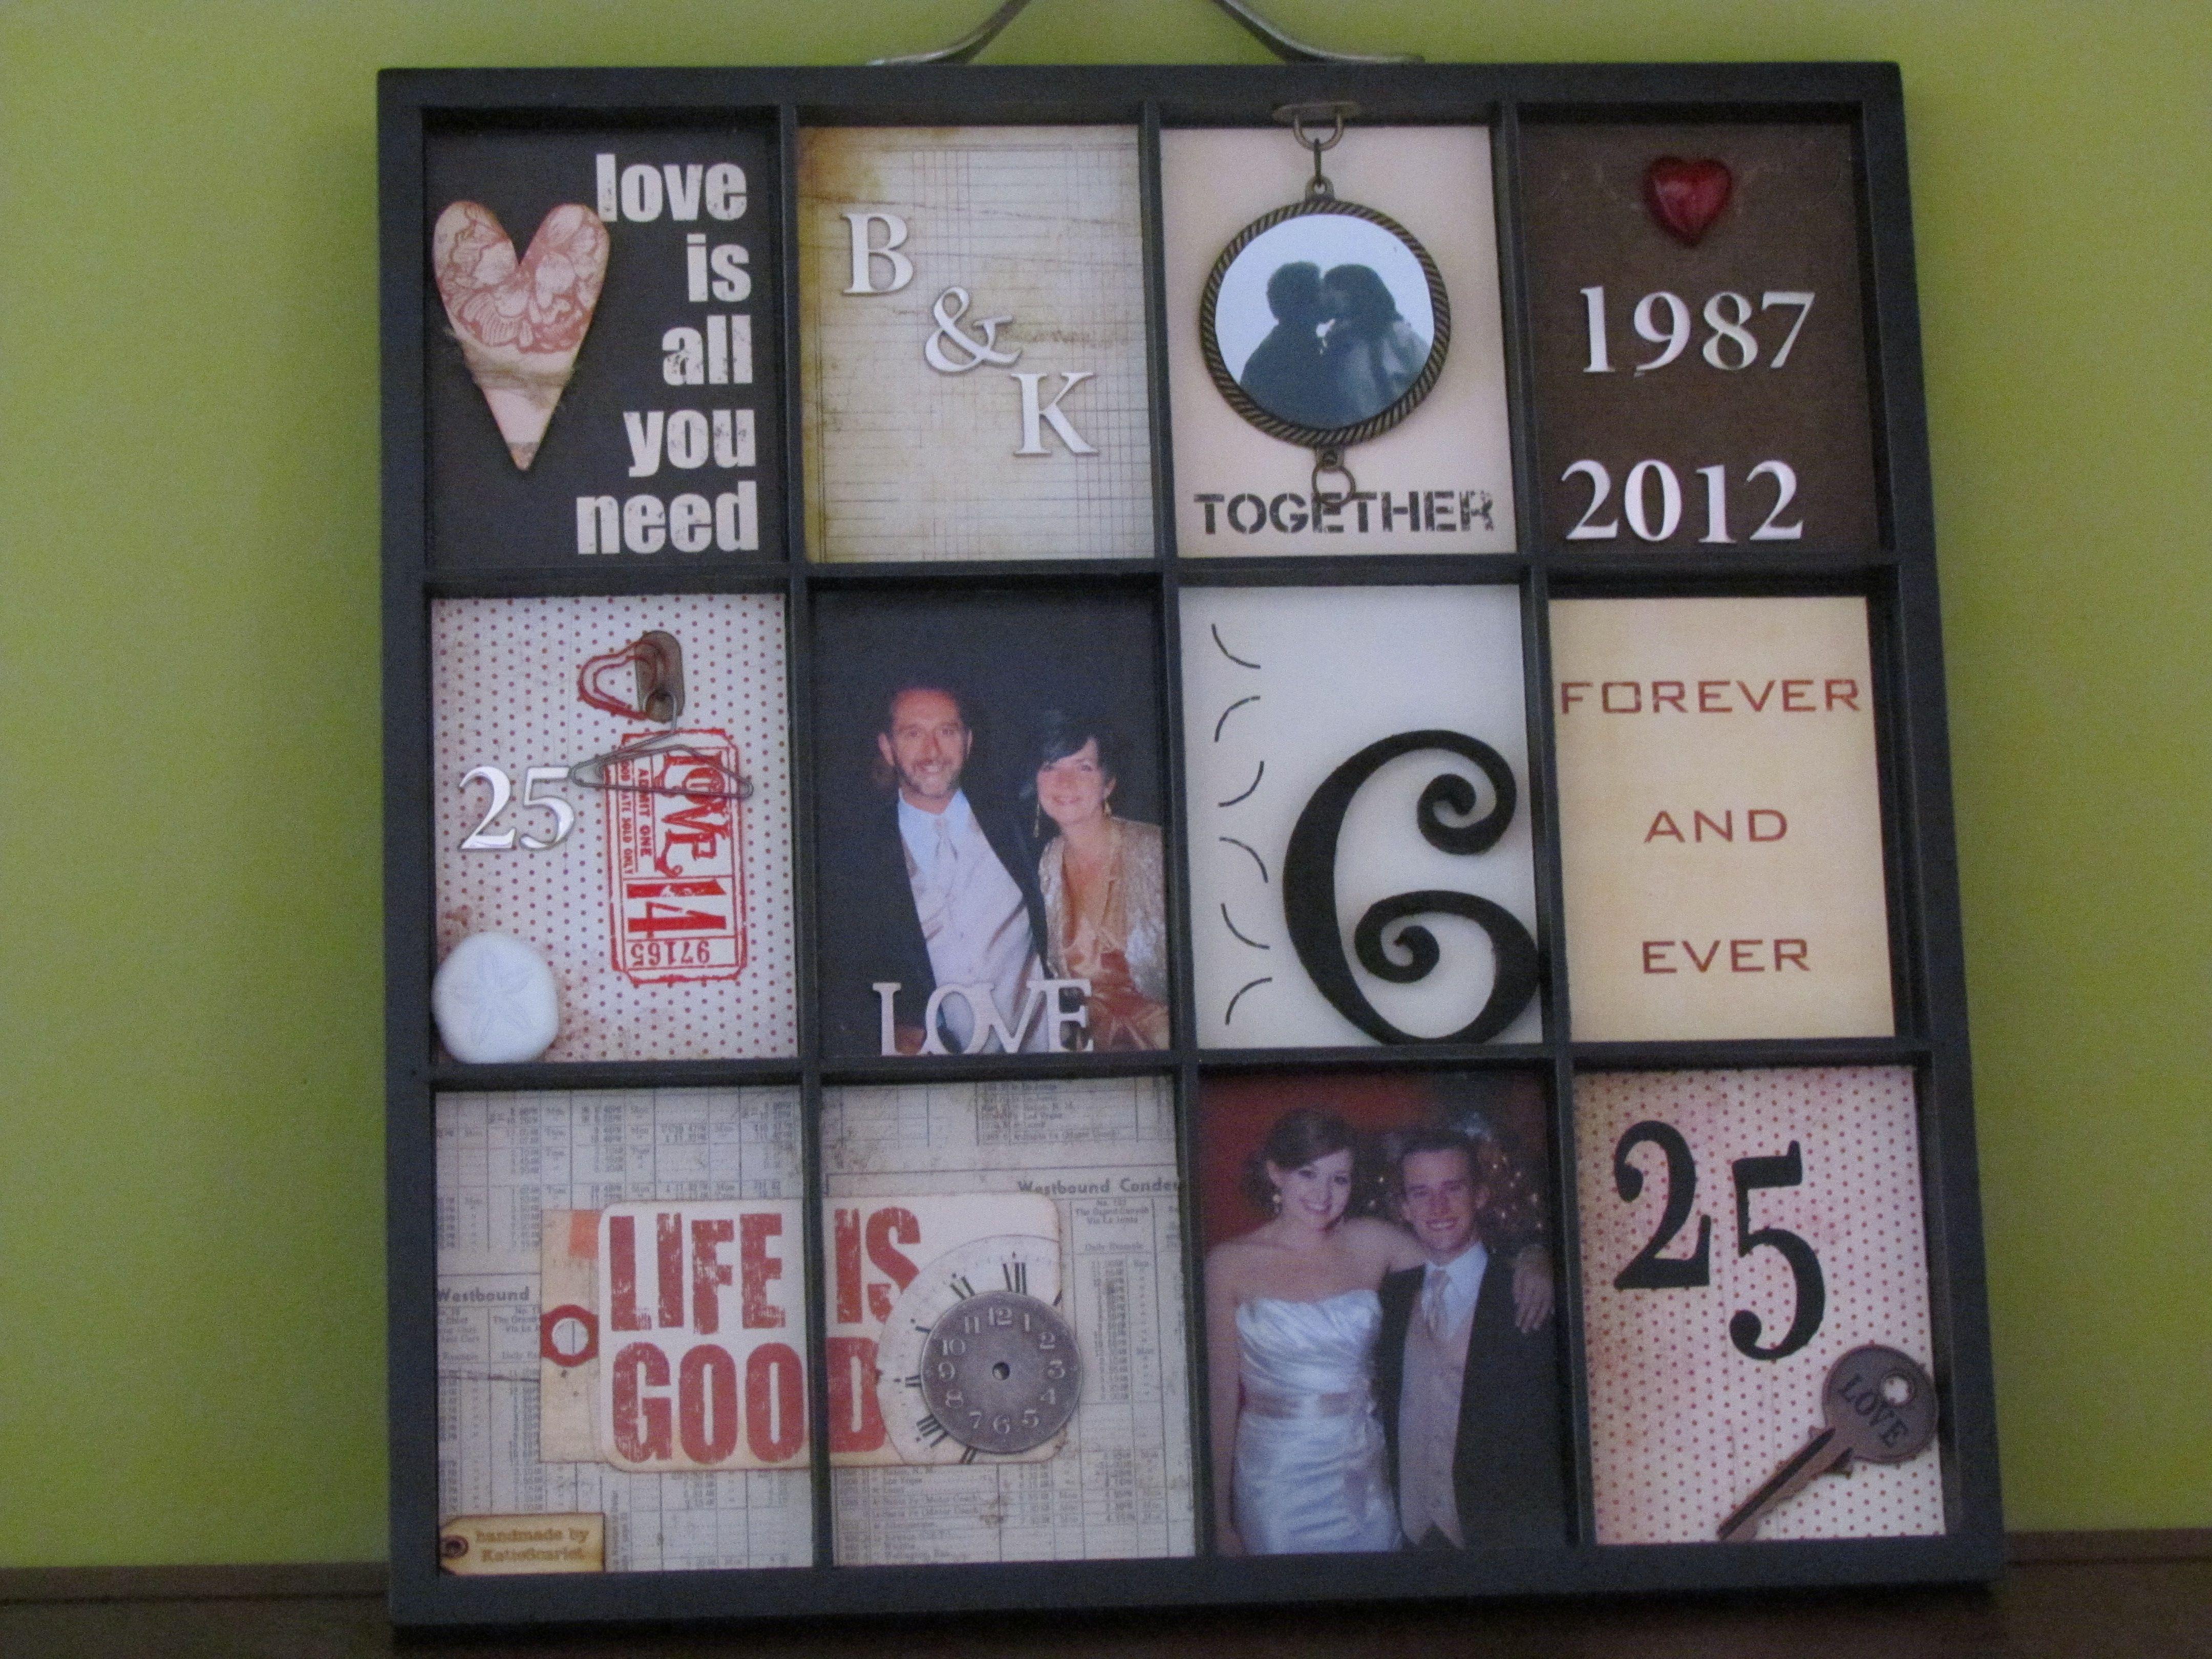 40th Wedding Anniversary Gift Ideas Parents: Printer's Tray - 25th Anniversary